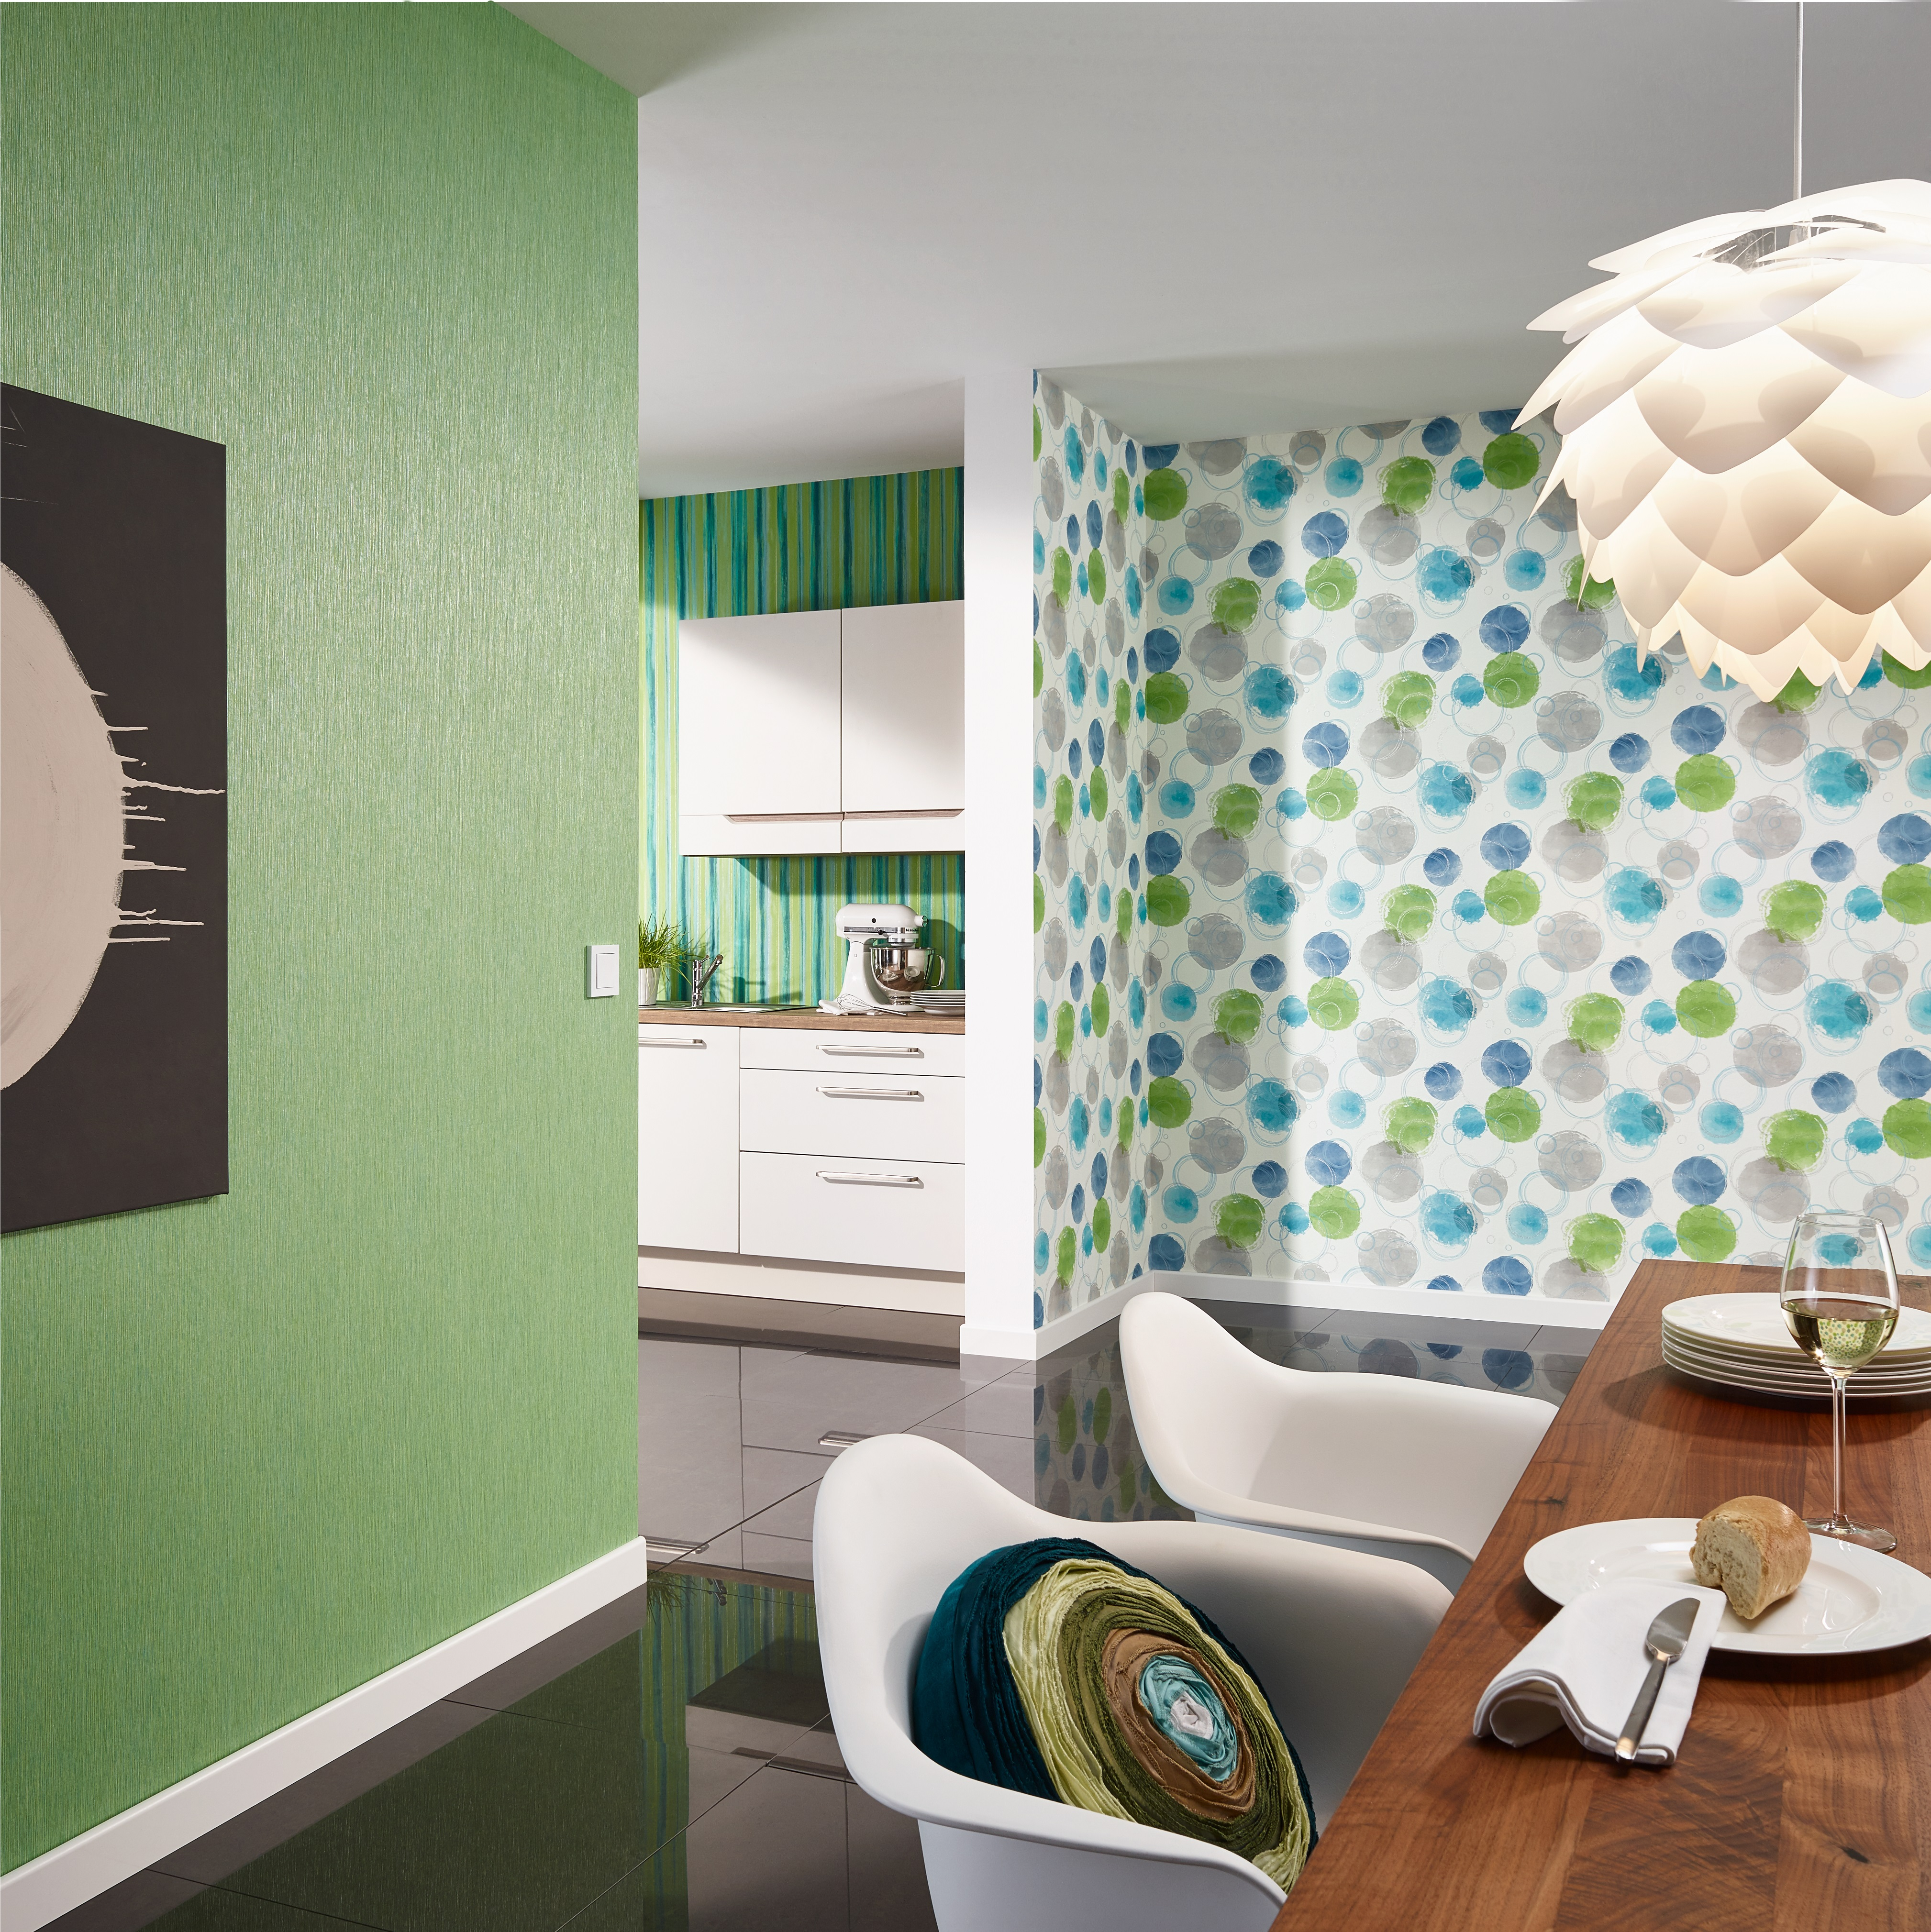 ausgefallene tapeten joratrend tapetenshop. Black Bedroom Furniture Sets. Home Design Ideas